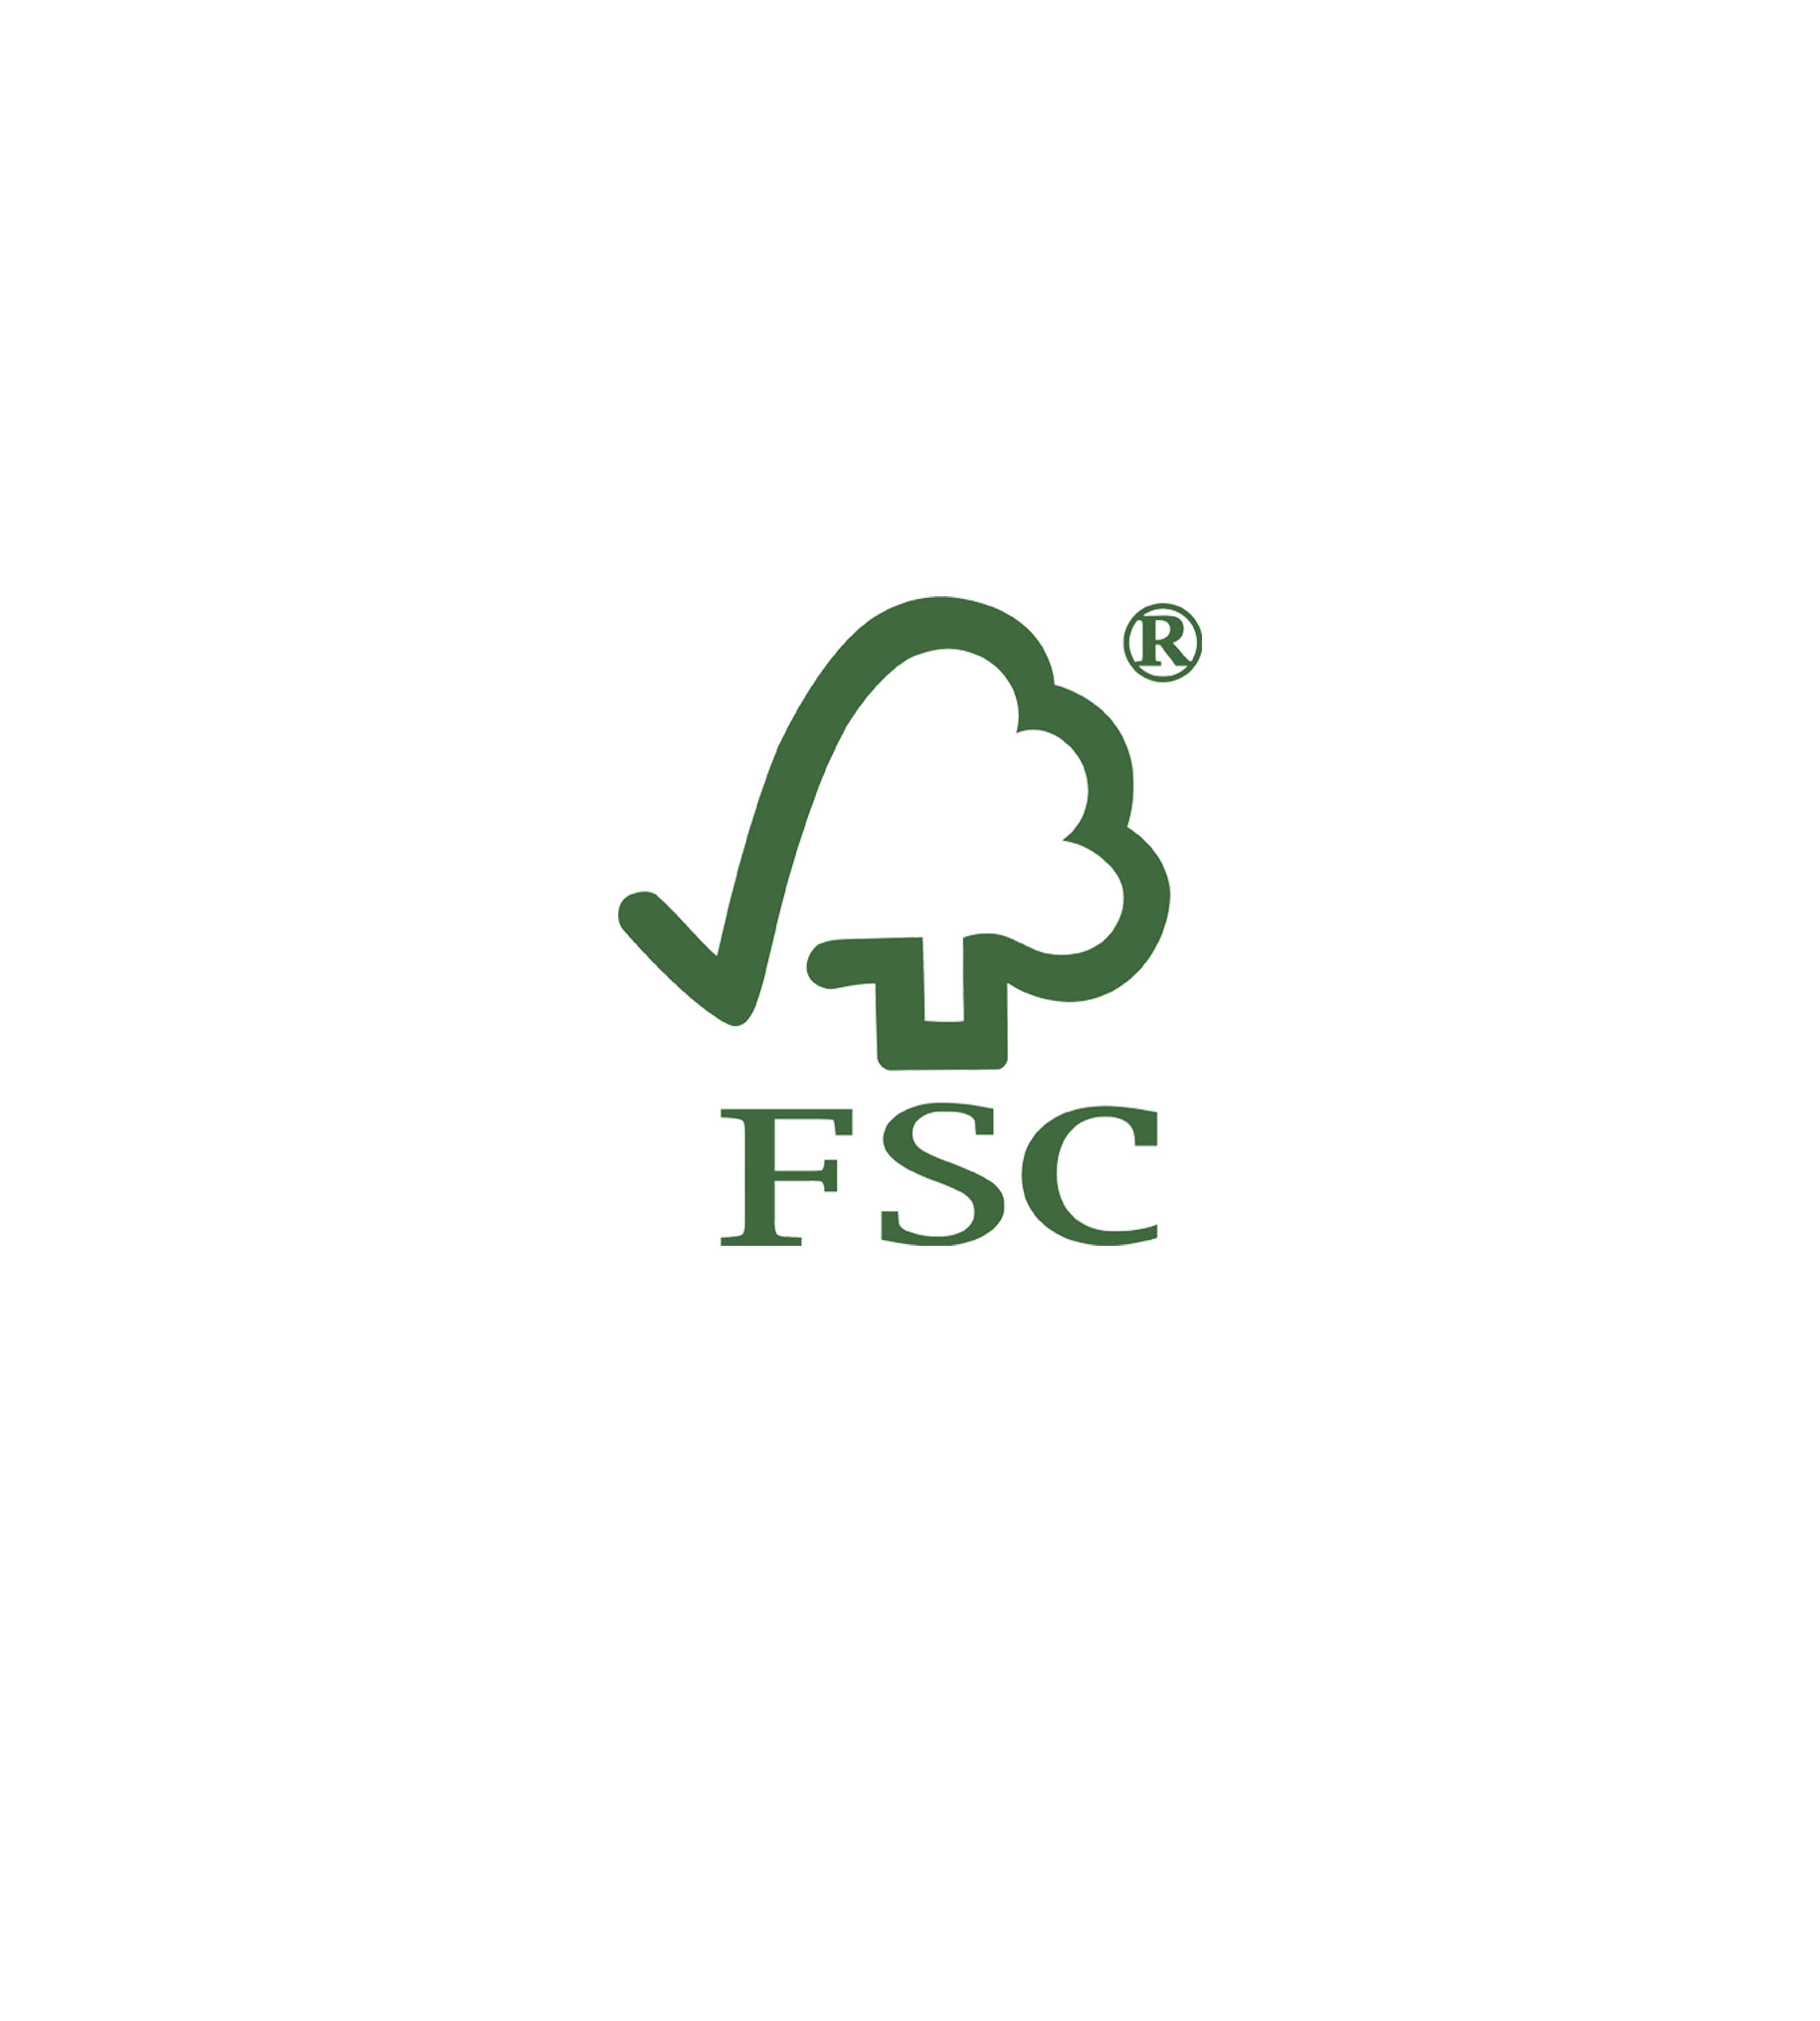 fsc-logo.jpg